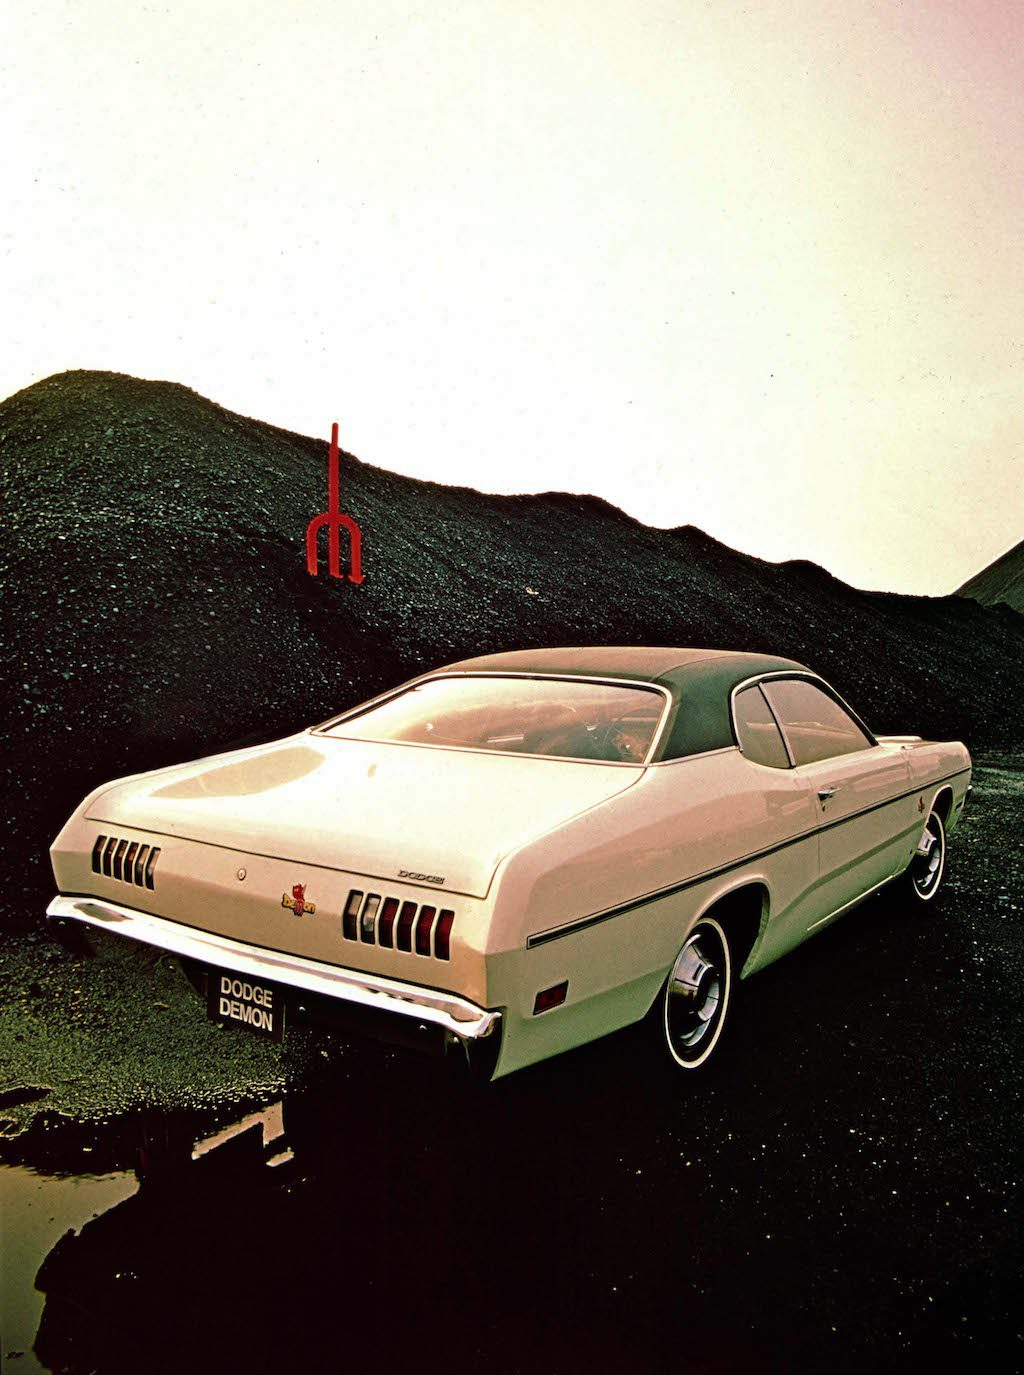 1971 Dodge Demon | Fiat Chrysler Automobiles